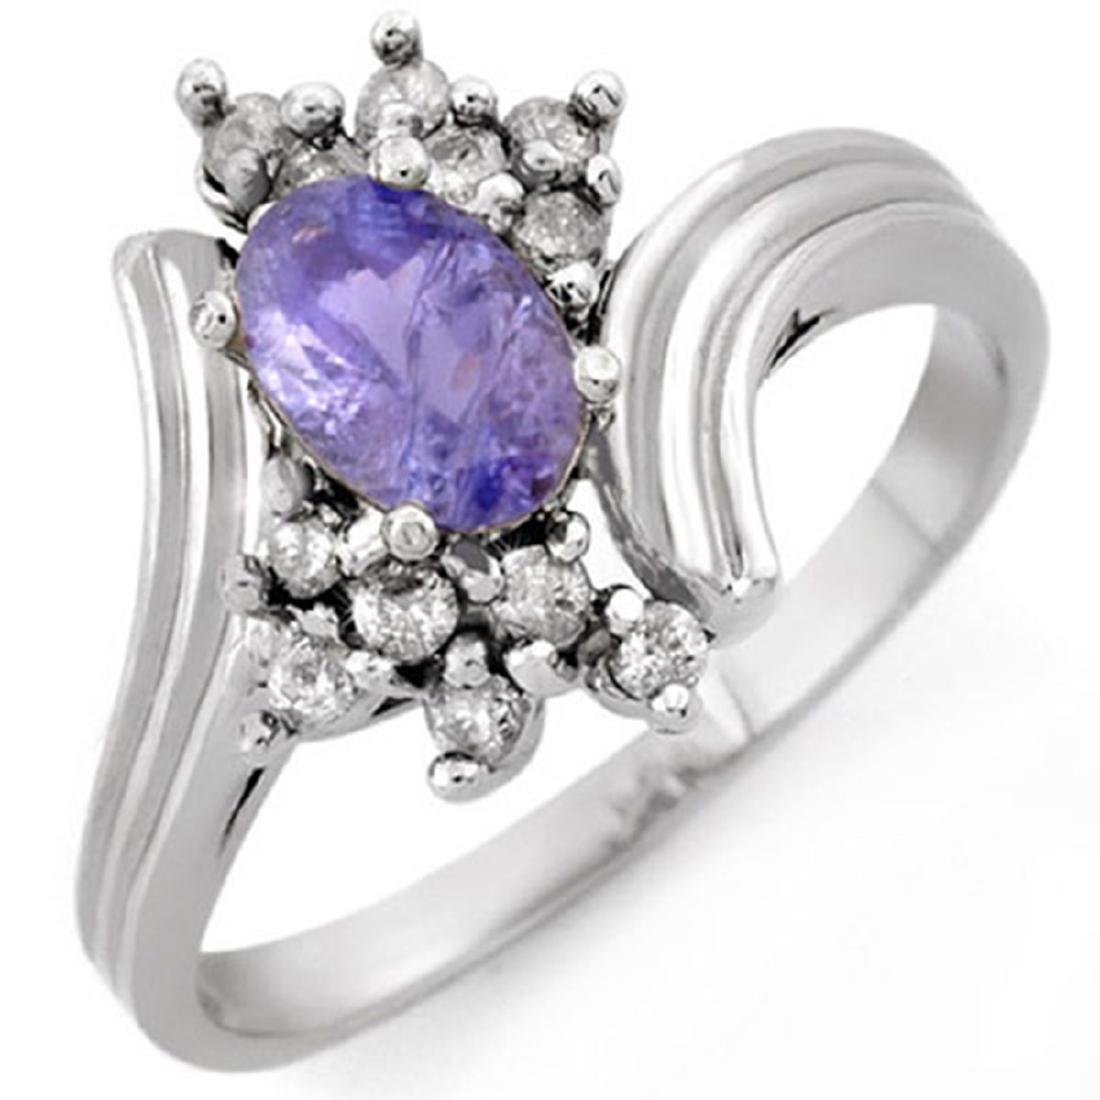 1.0 CTW Tanzanite & Diamond Ring 10K White Gold